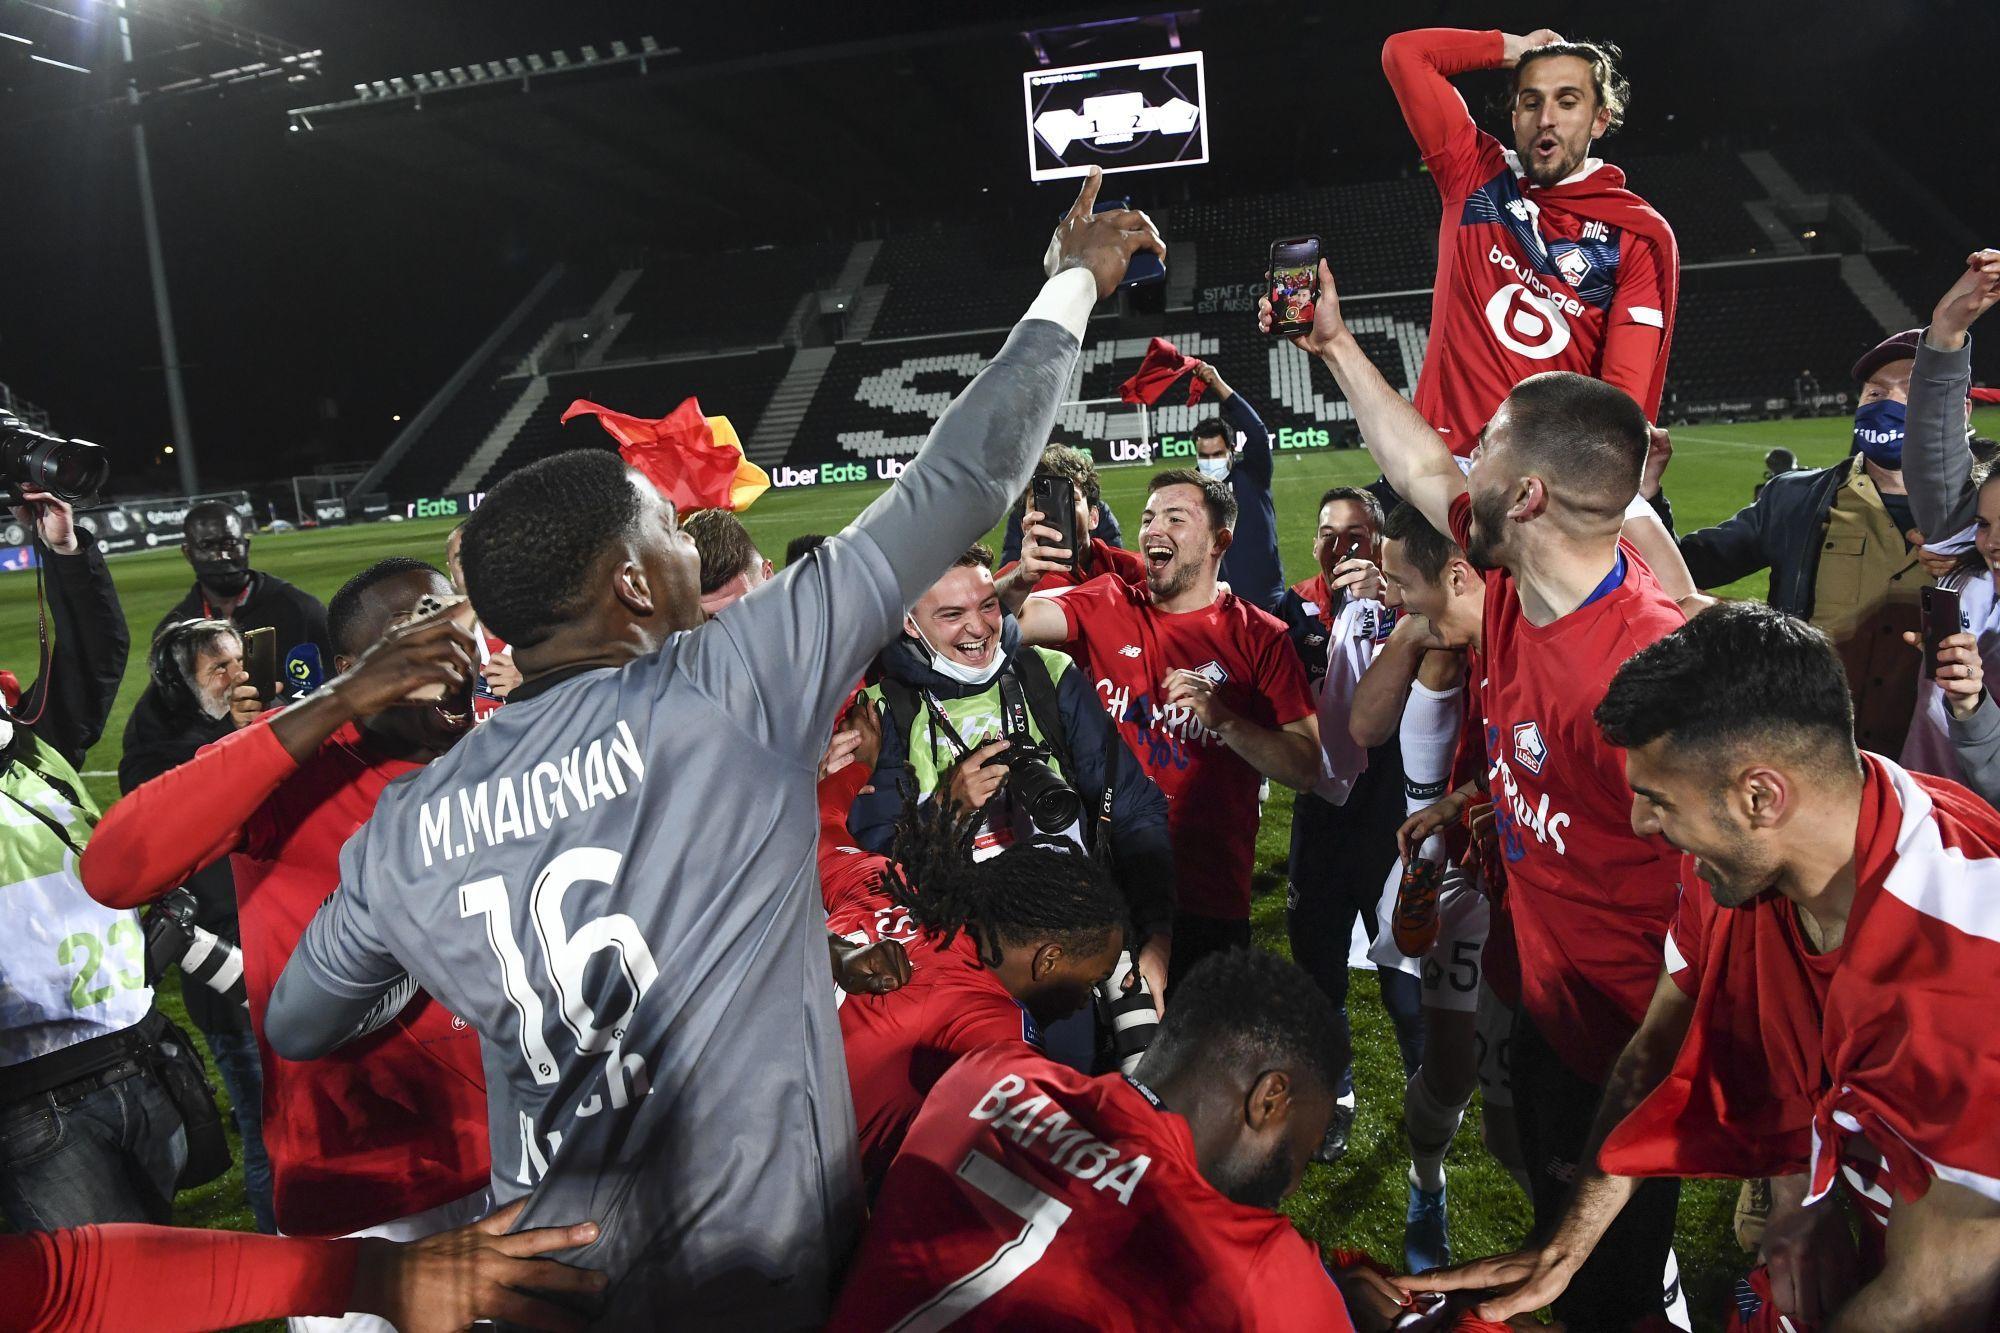 Juara Lille Ligue 1